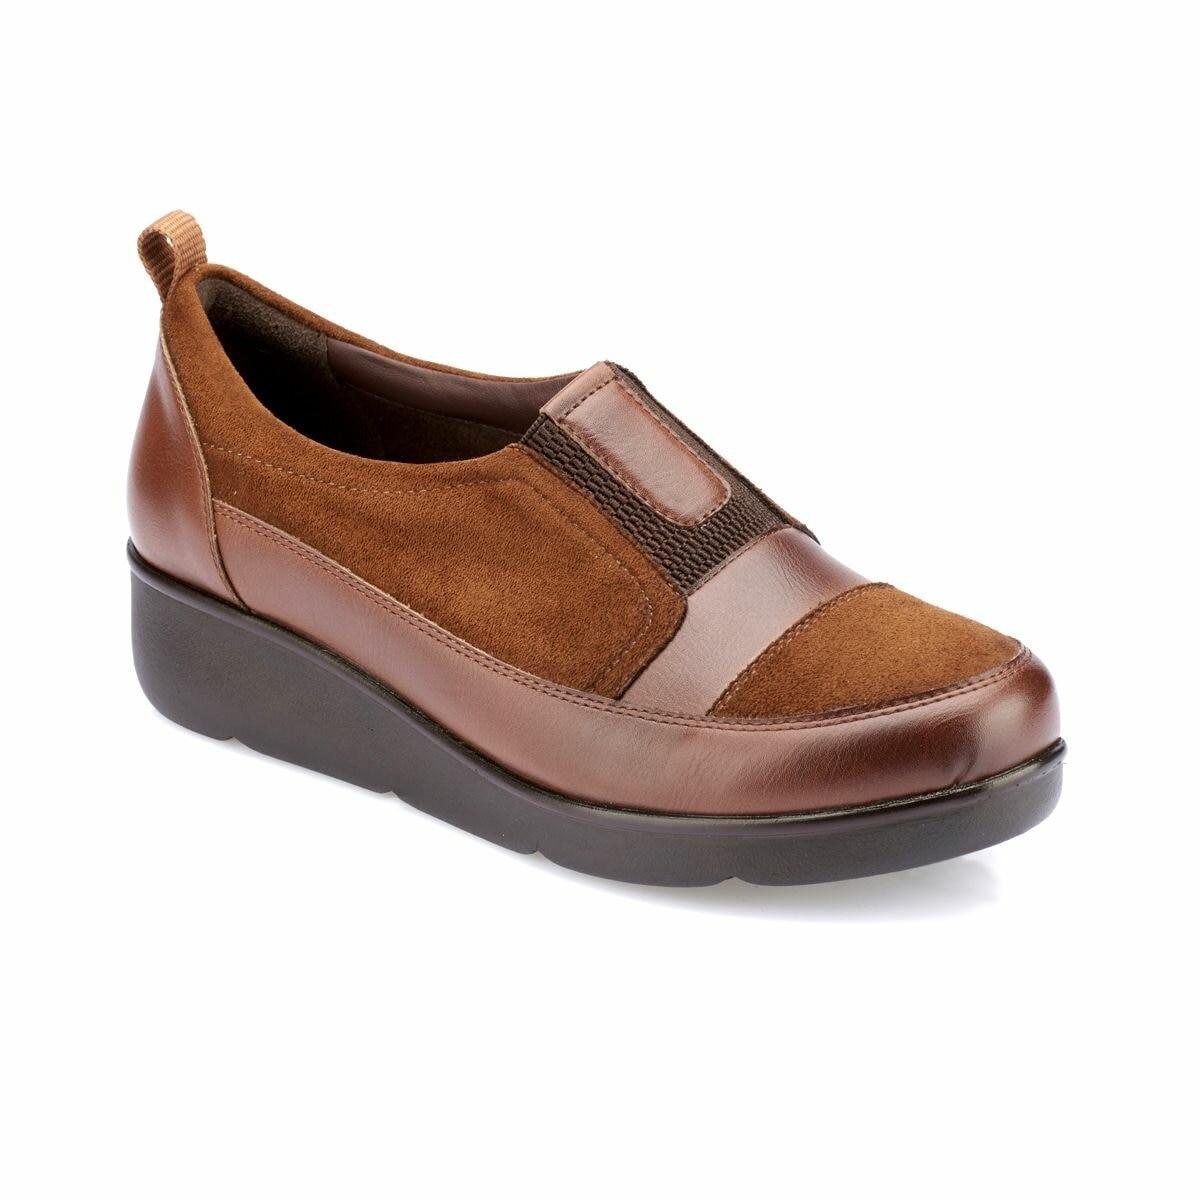 FLO 82.100114.Z Tan Women 'S Shoes Polaris 5 Point